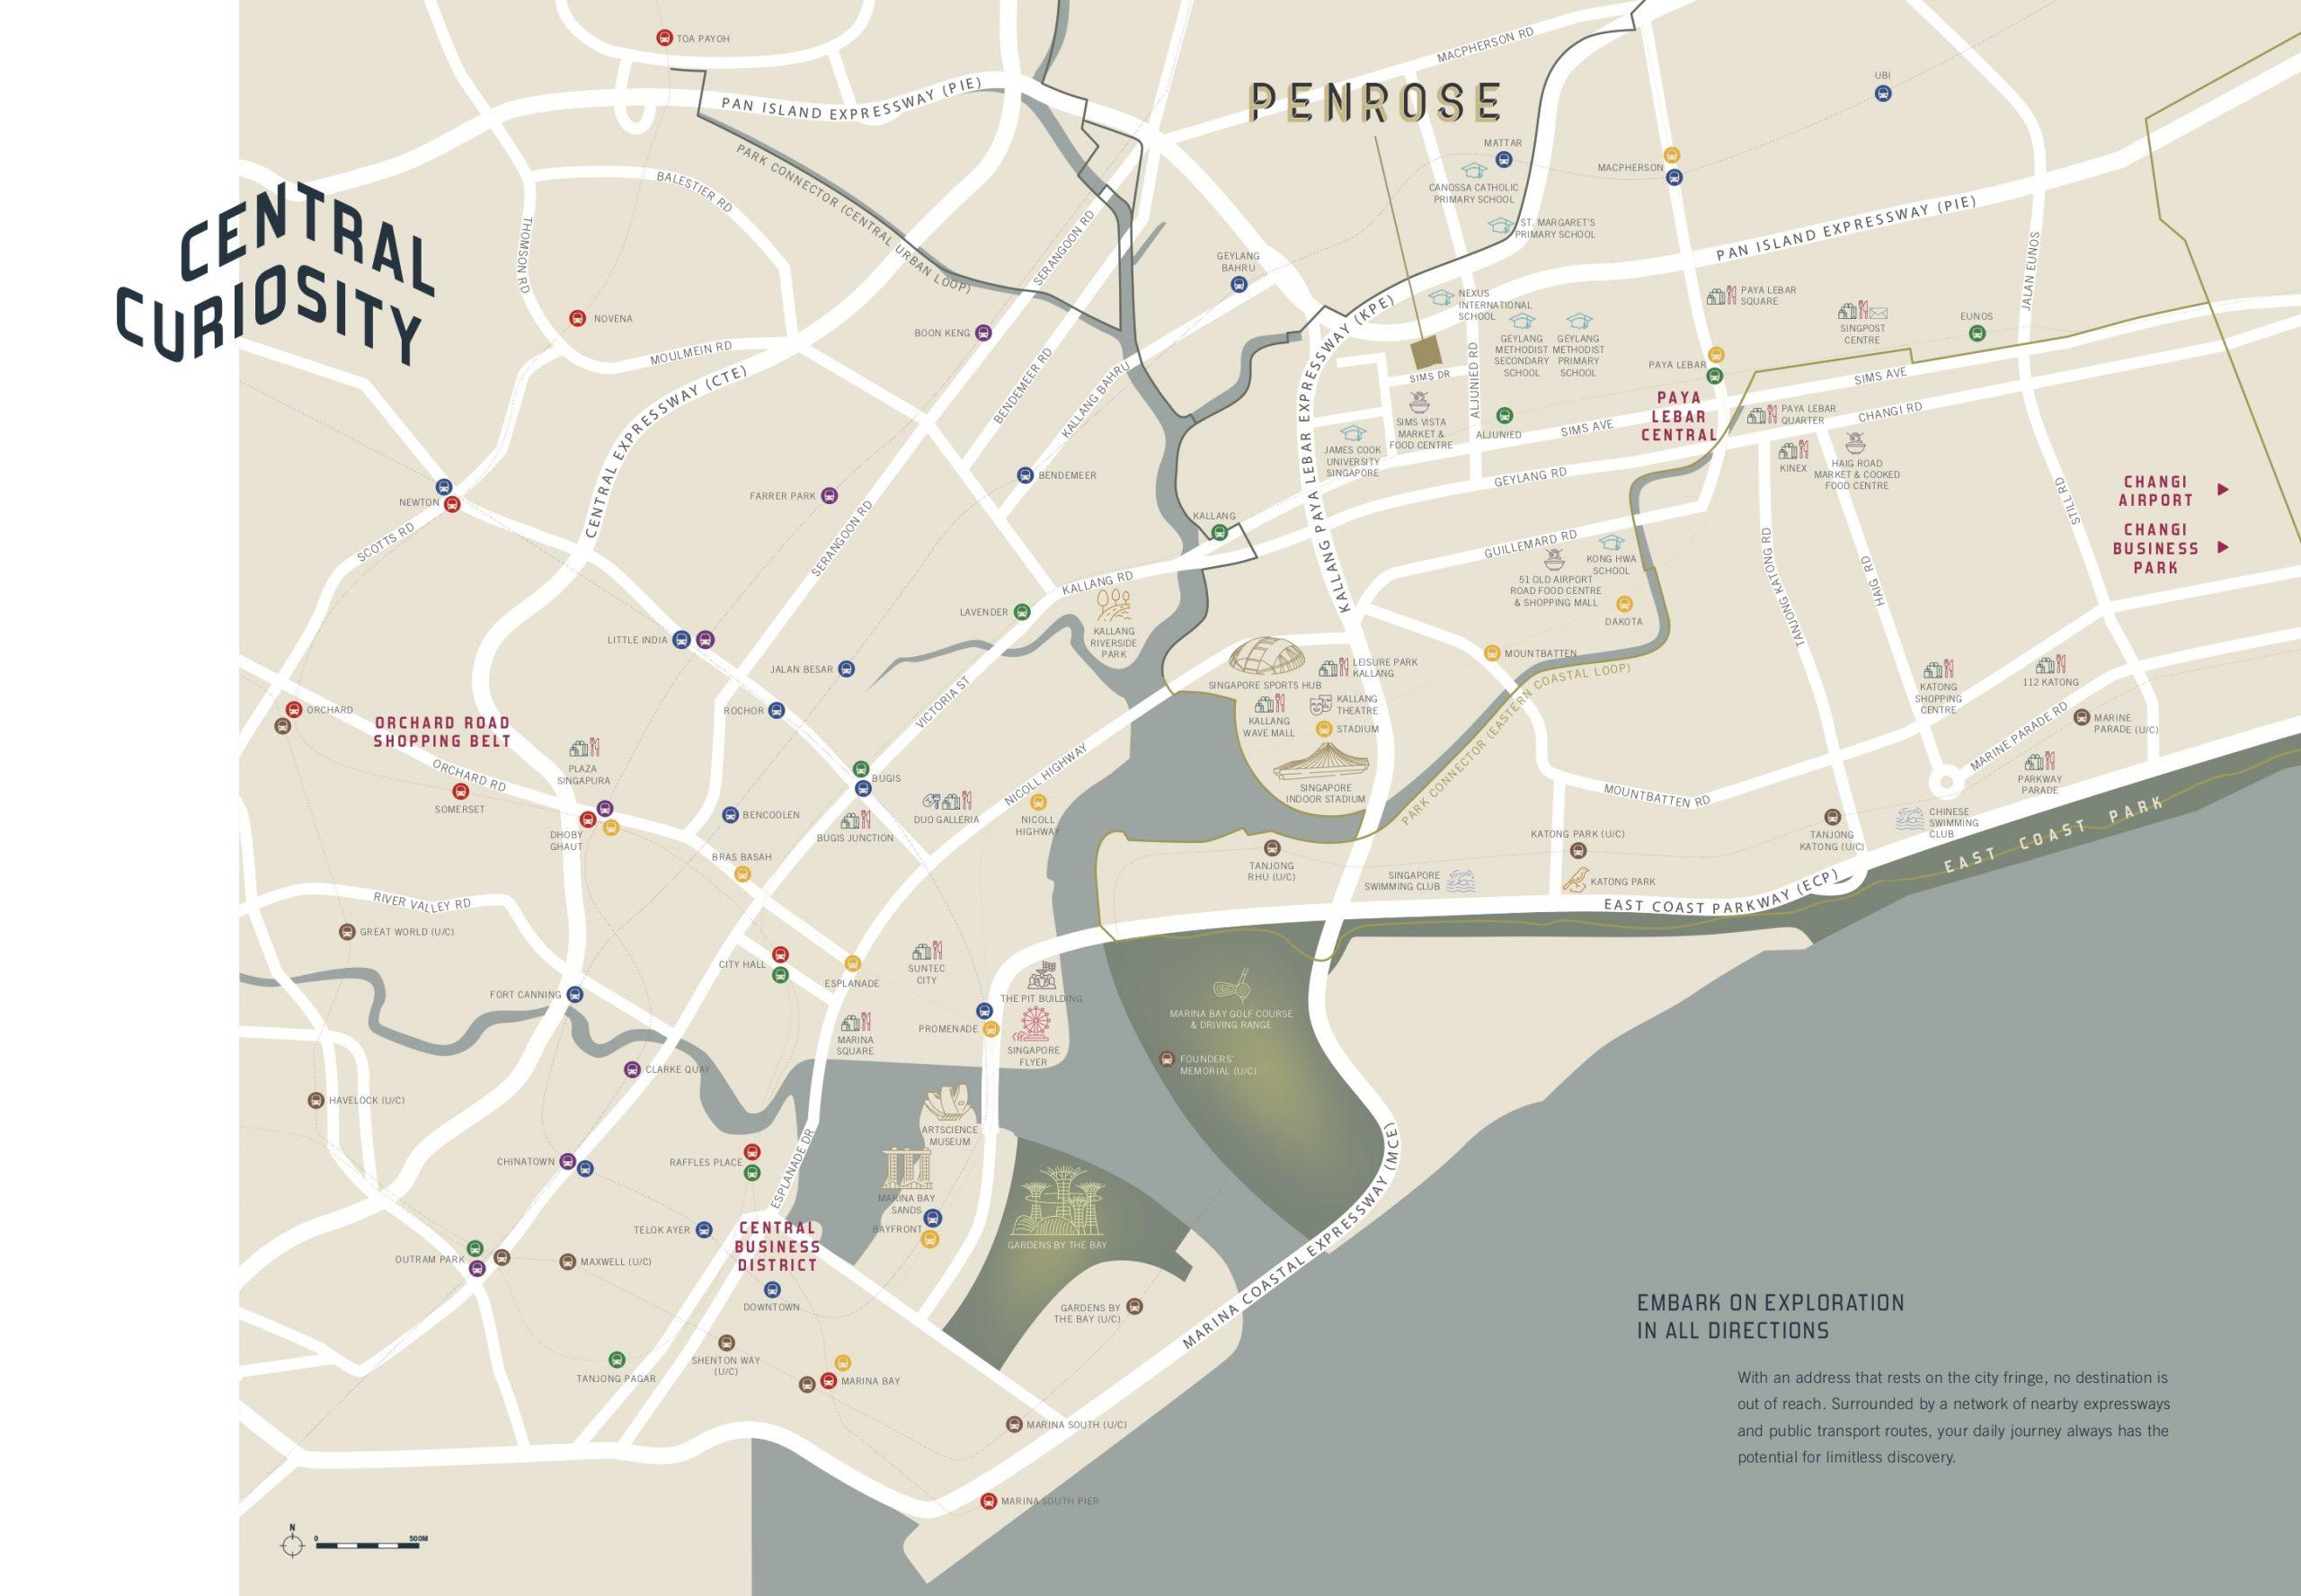 penrose_location_sims_drive_aljunied_mrt